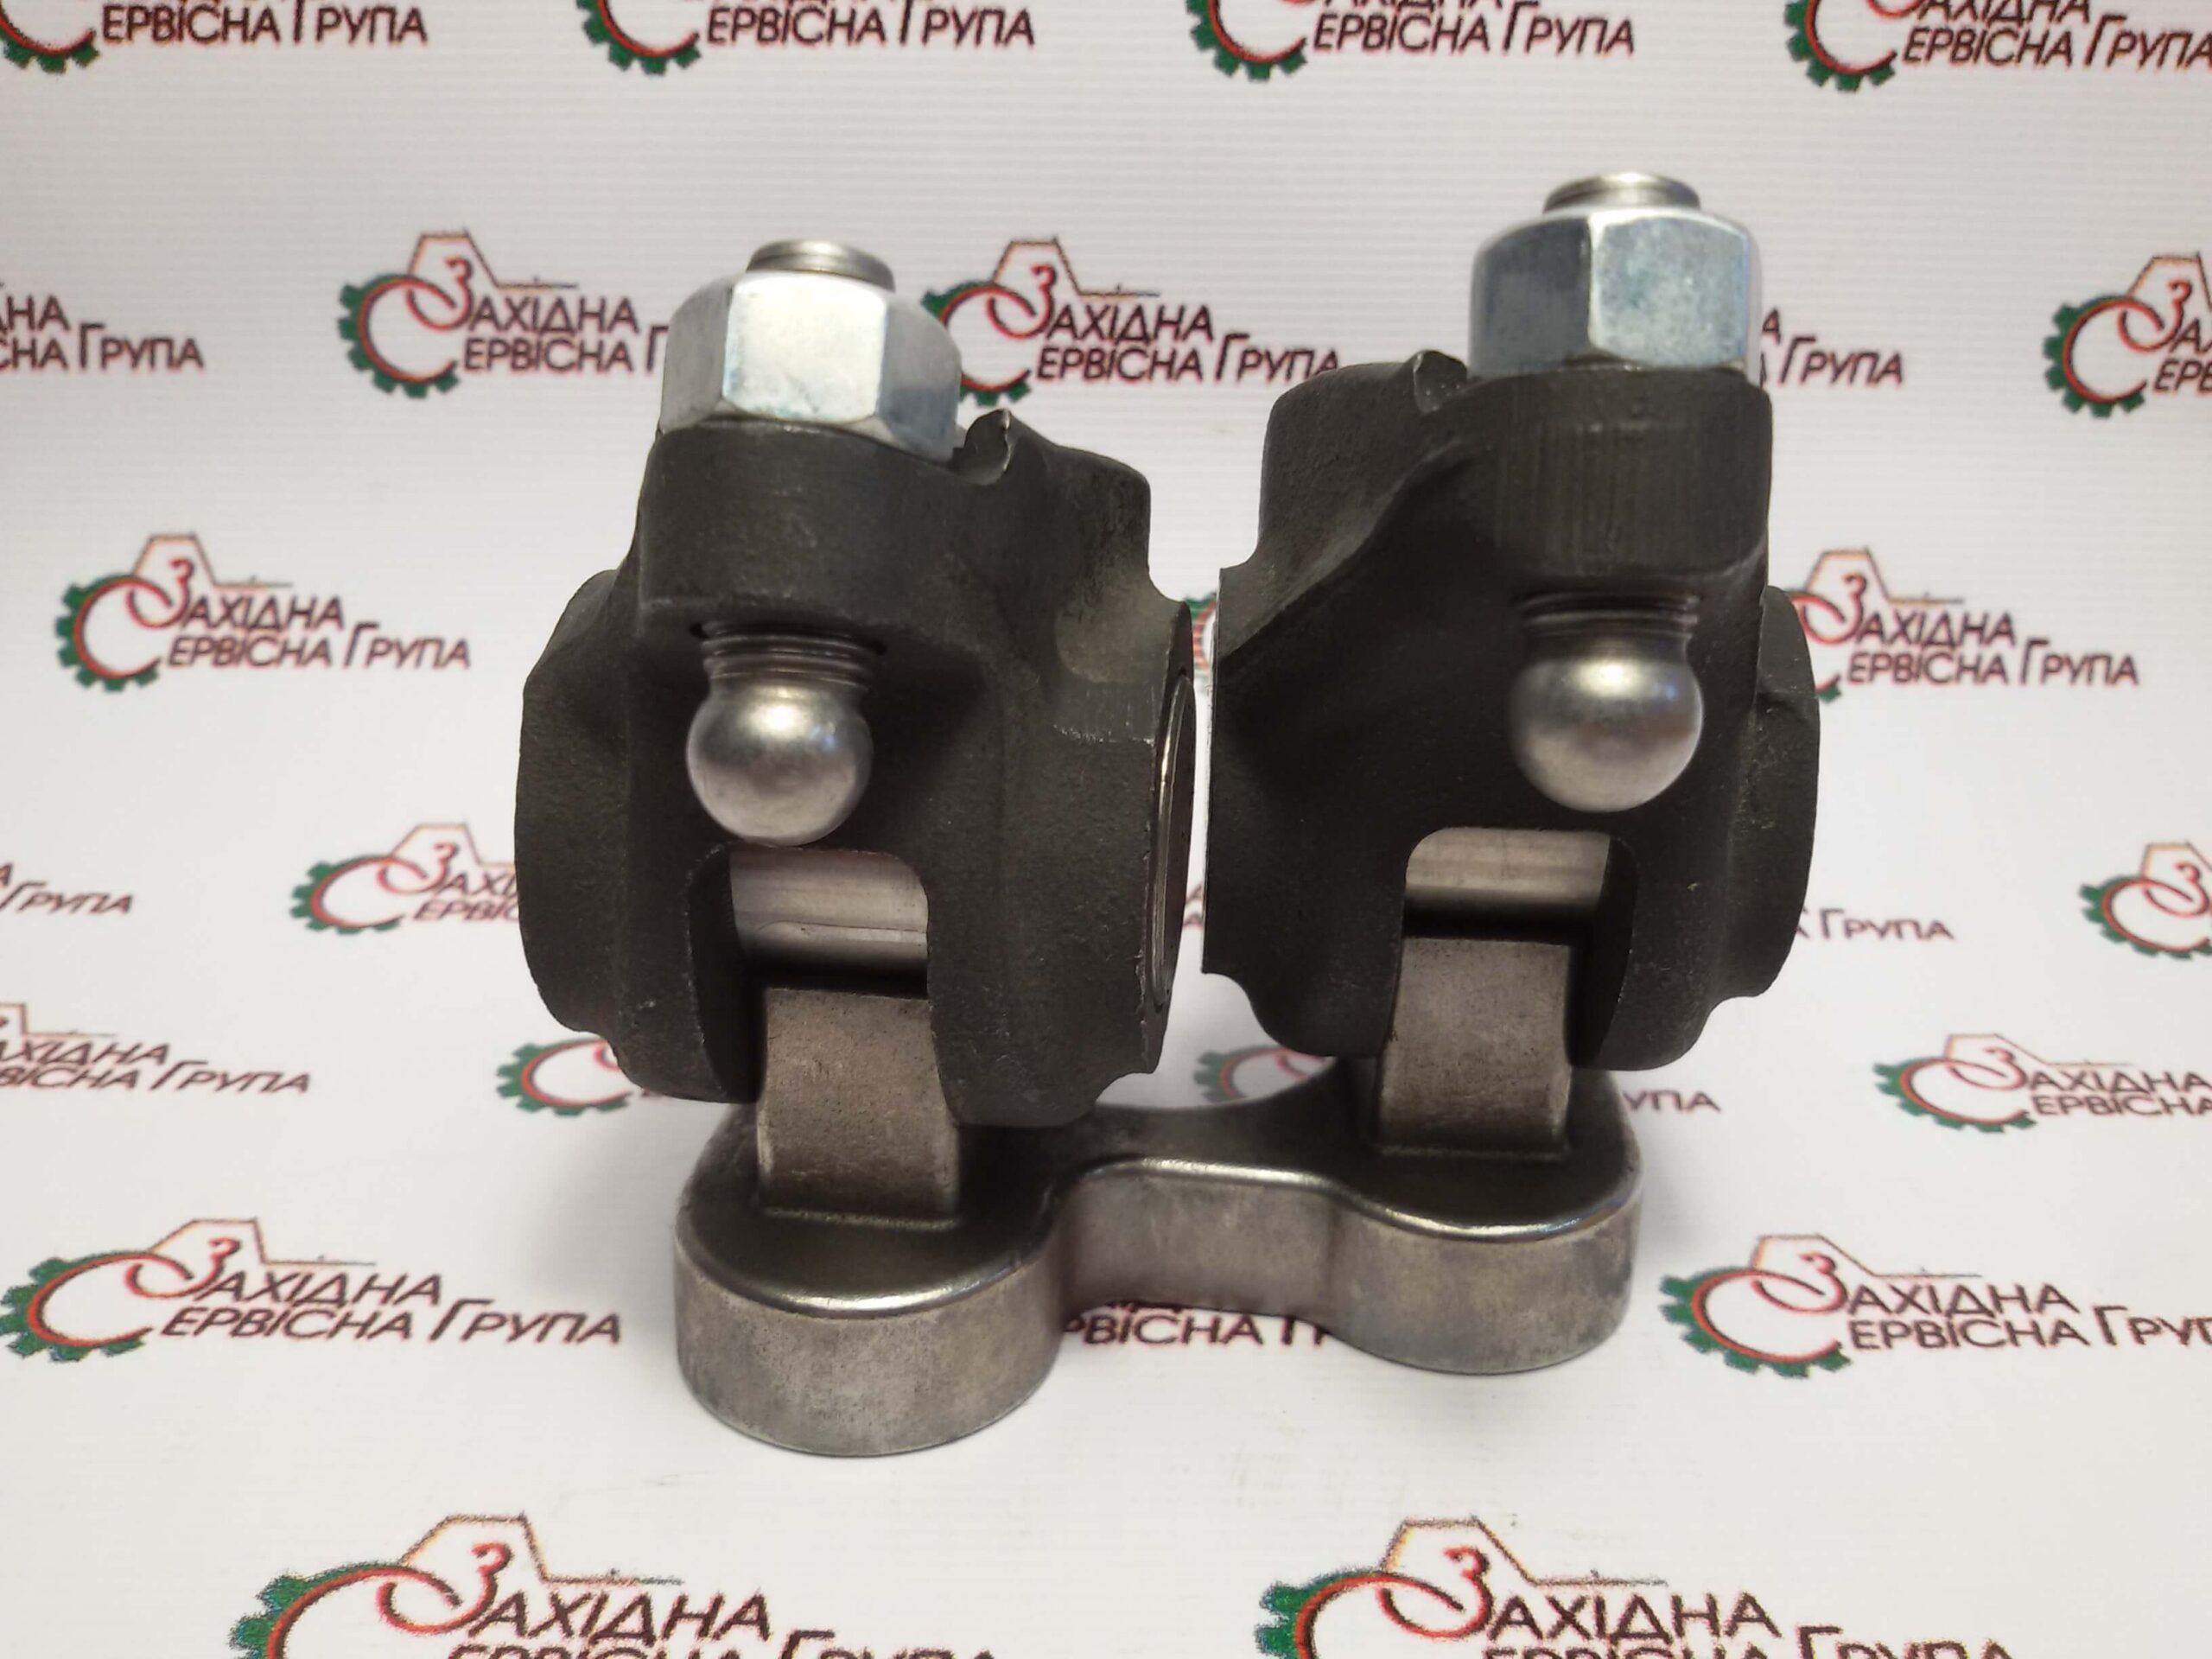 Рокер клапана (узел рокеров) Cummins ISB, ISD, QSB6.7, 4995602, 4928698.